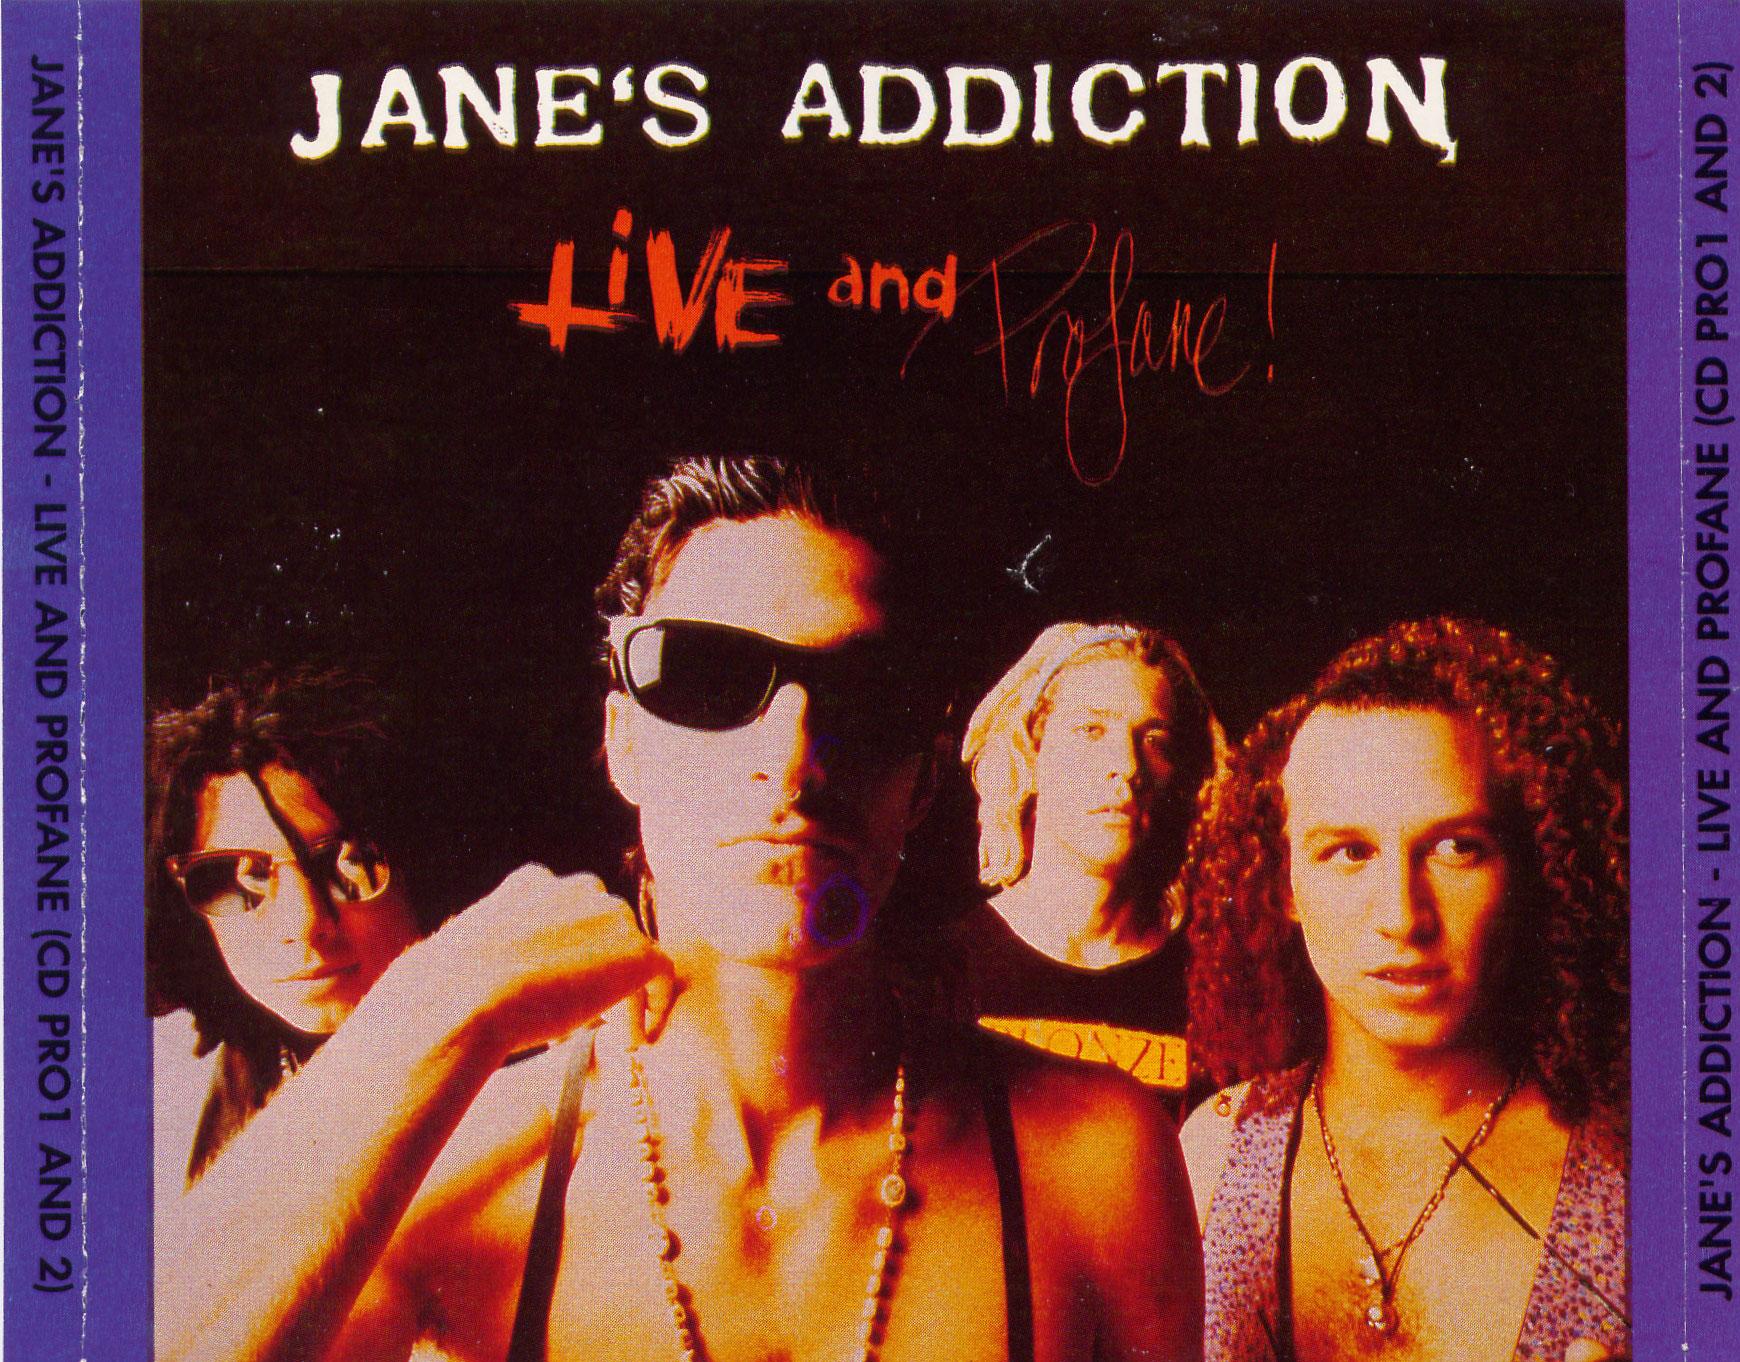 janes addiction torrents